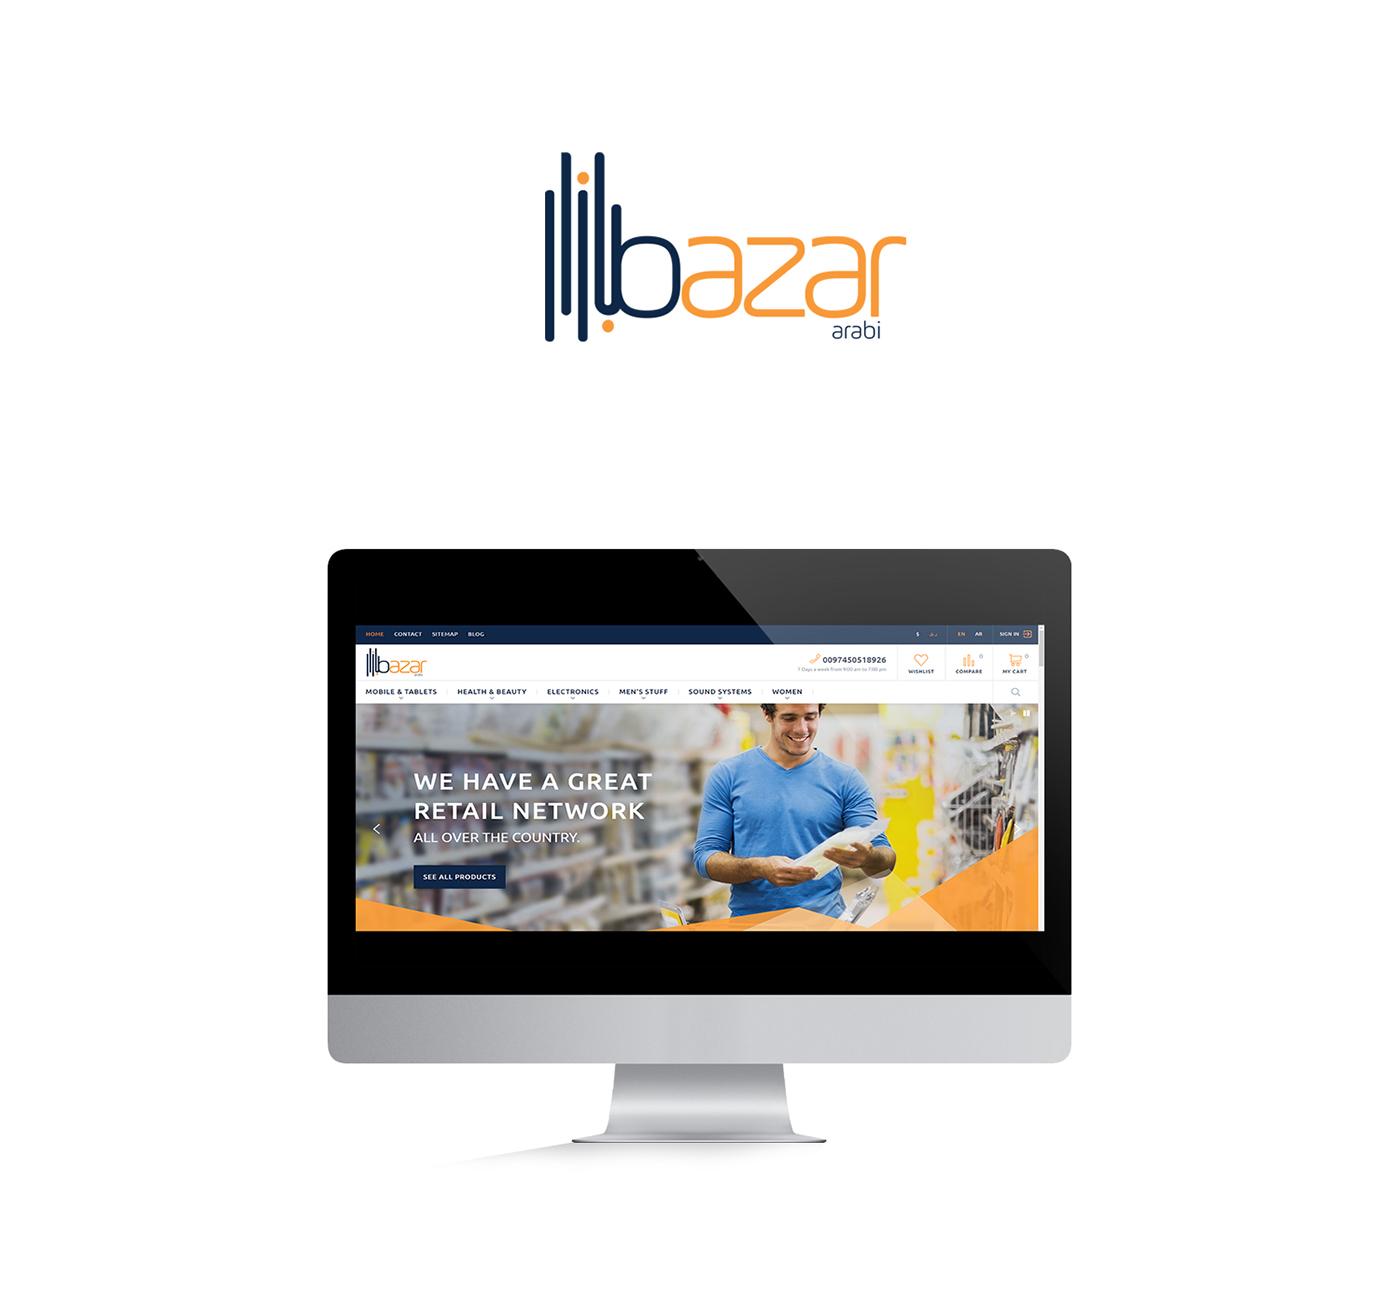 bazararabi bazararabi.com Saeed elgarf logo Arabic logo websites